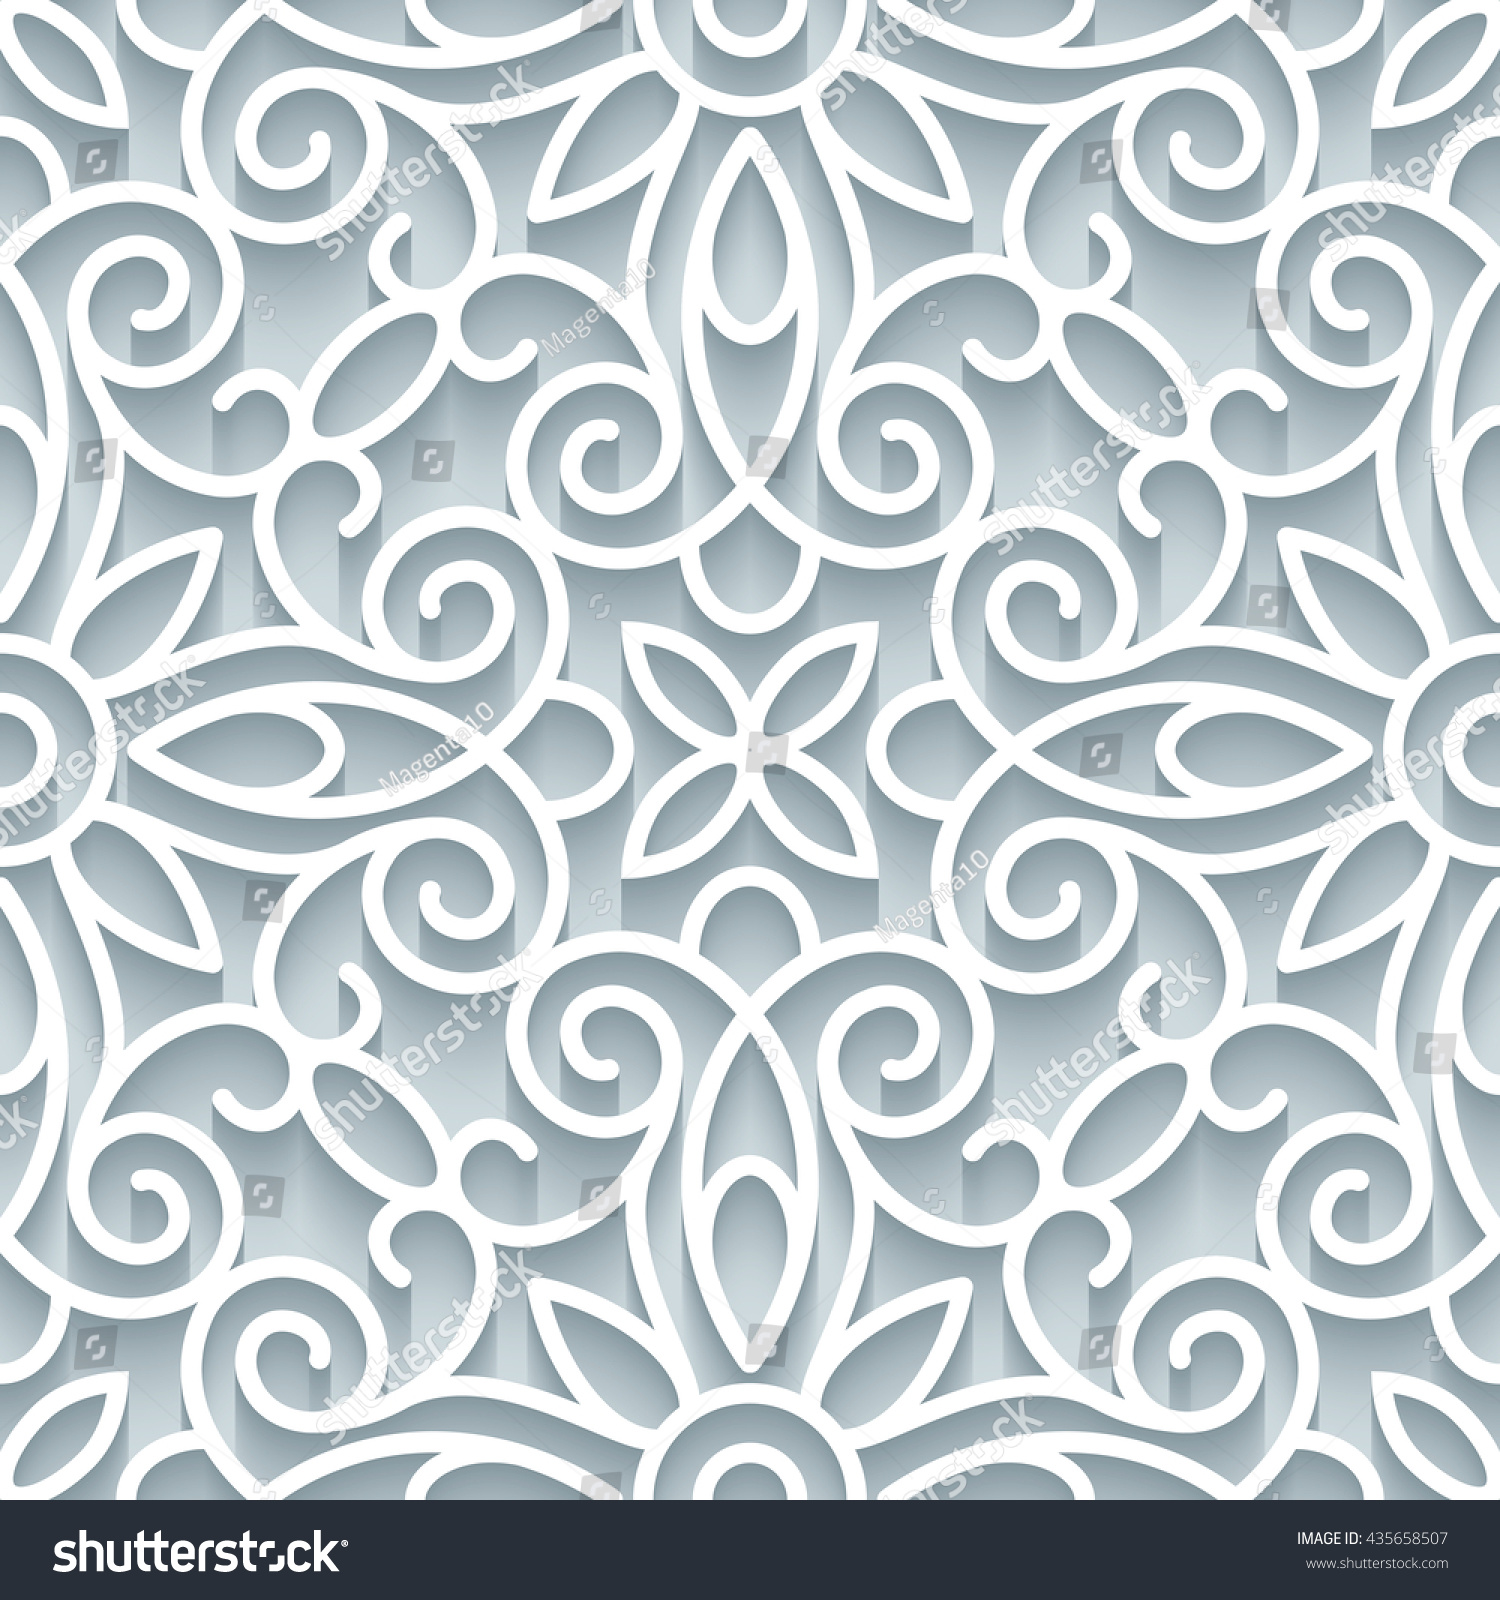 texture paper ornament - photo #12